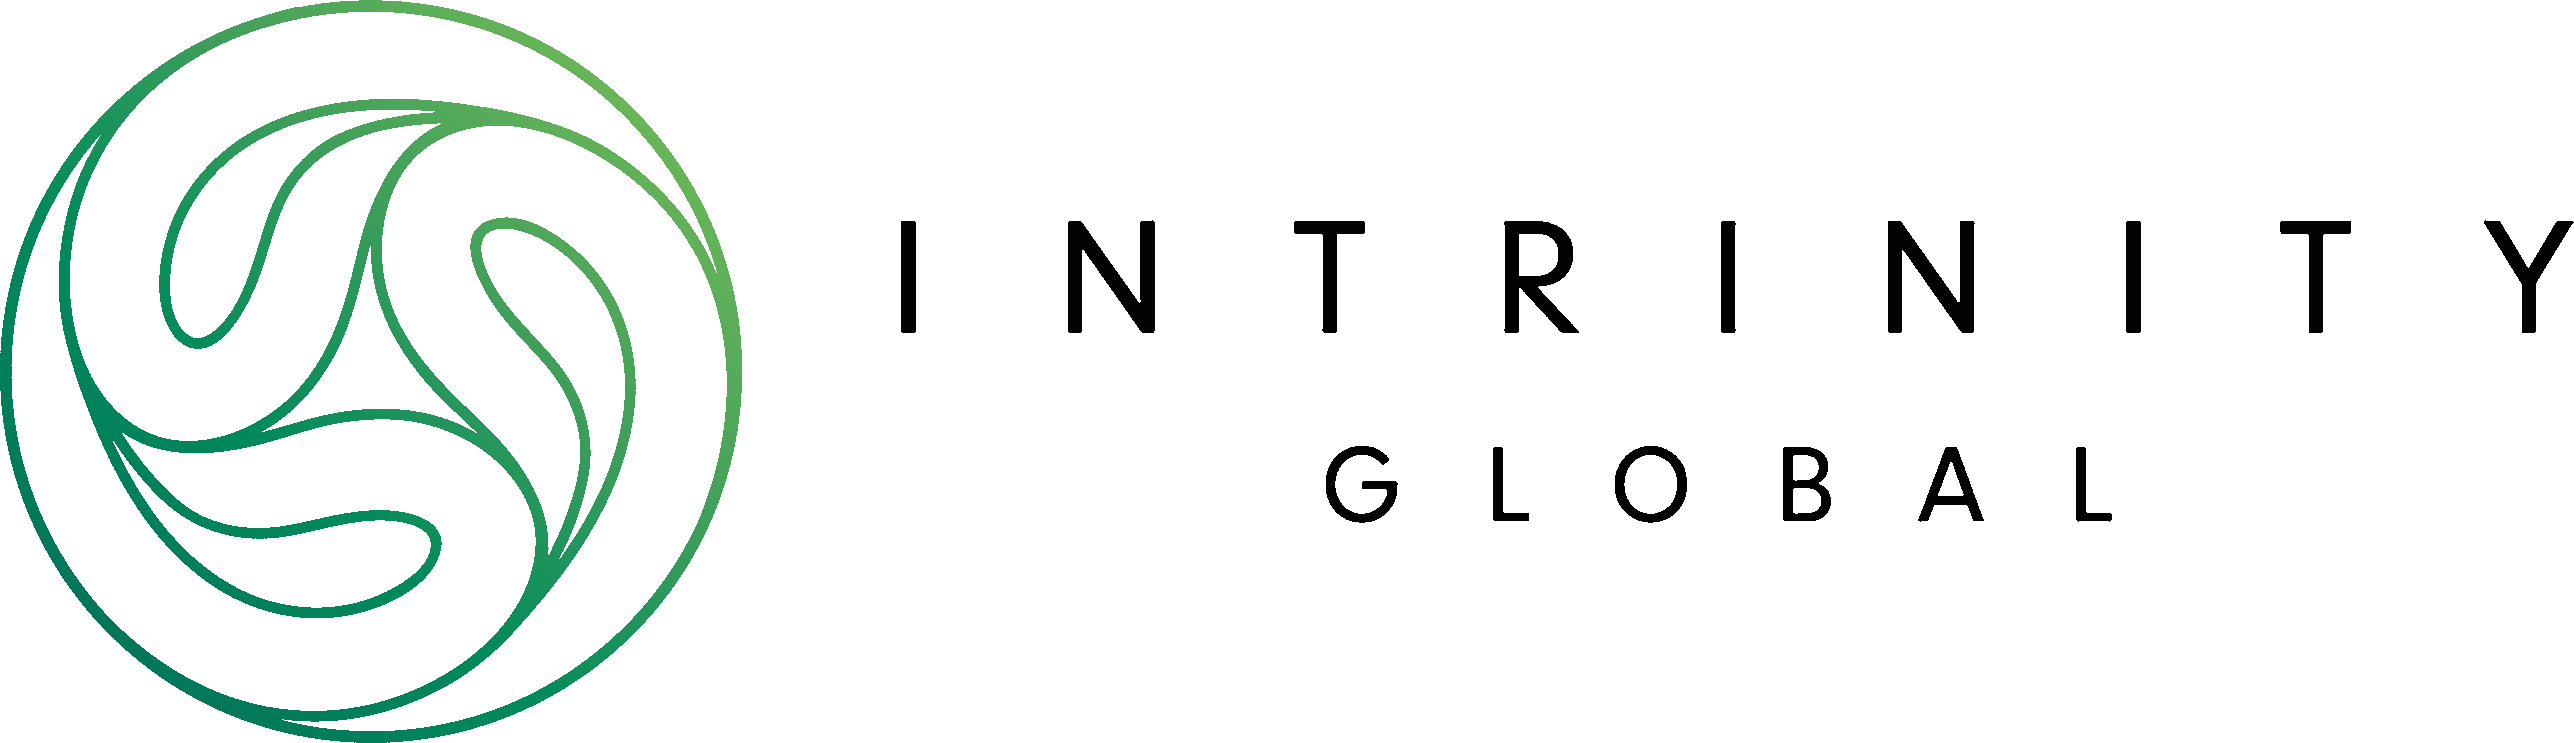 Intrinity Global